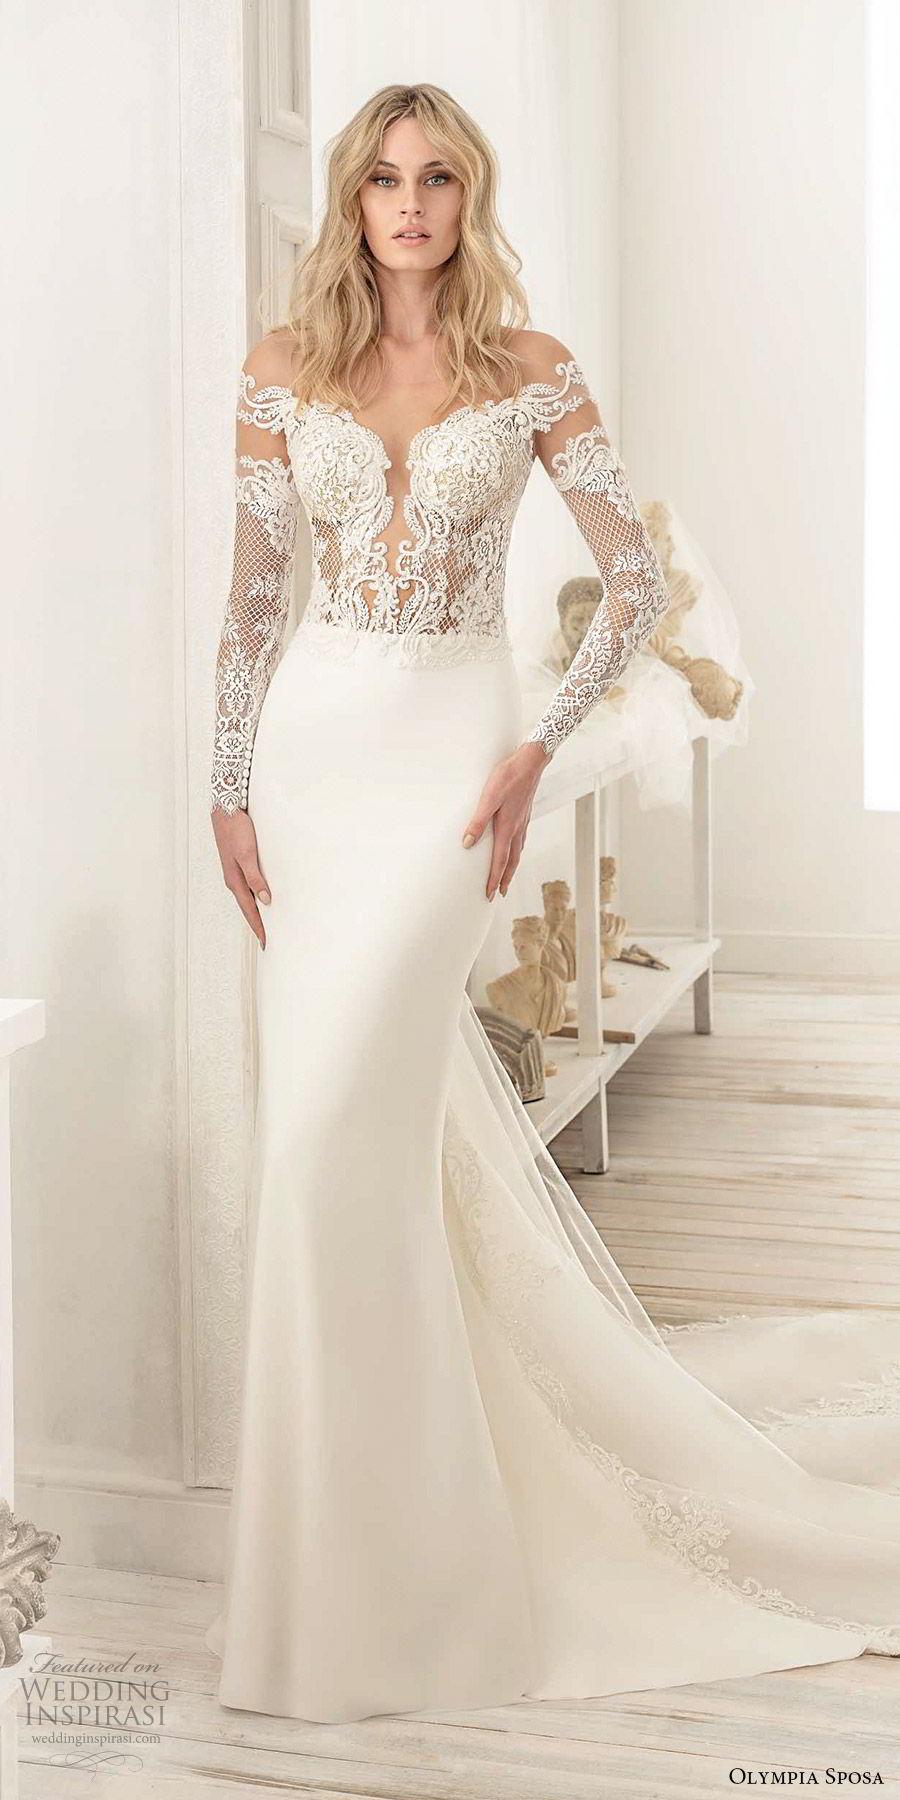 olympia sposa 2020 bridal off shoulder illusion long sleeves heavily embellished bodice sheath wedding dress (9) elegant sexy v back cathedral train mv